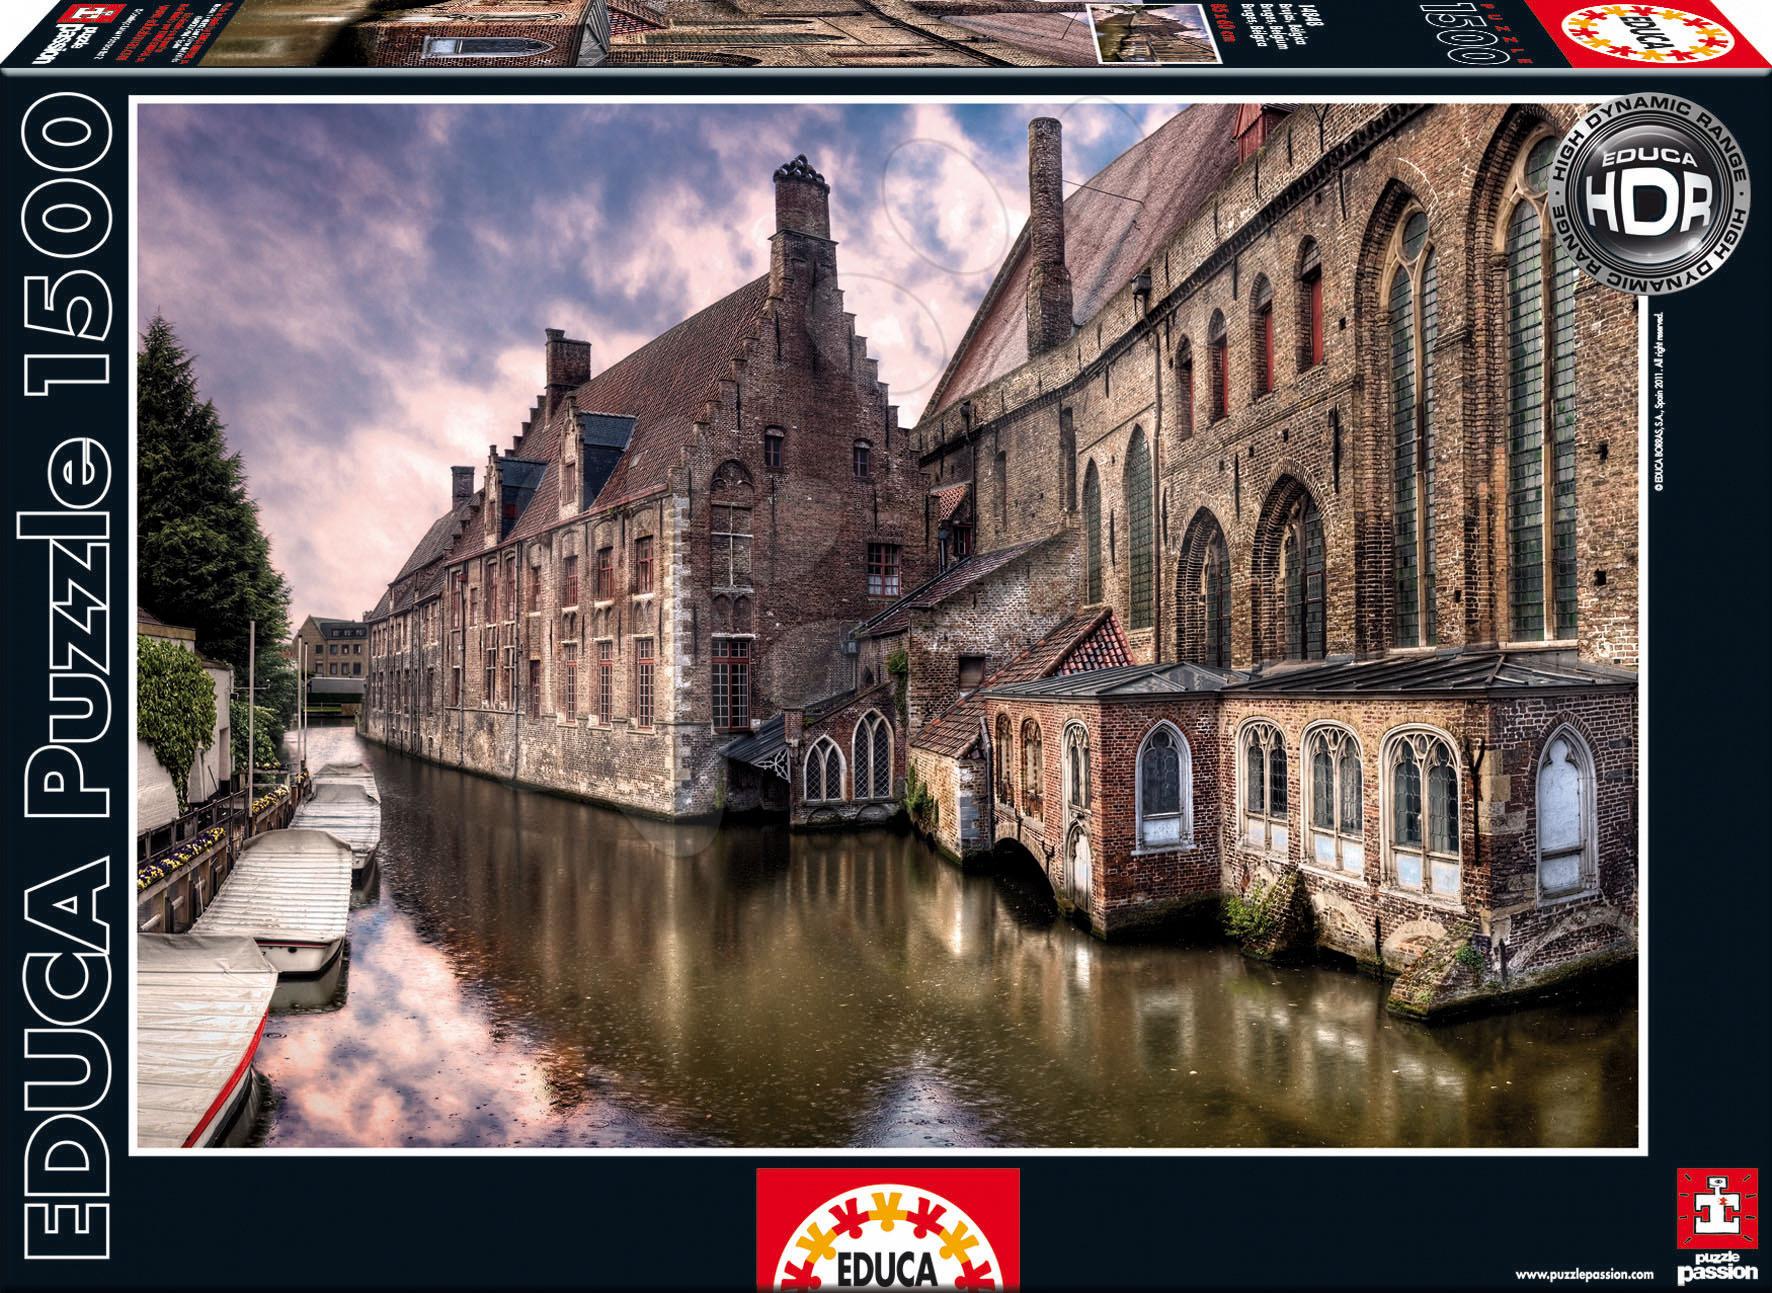 Puzzle 1500 dílků - Puzzle Bruges Educa 1 500 dílů